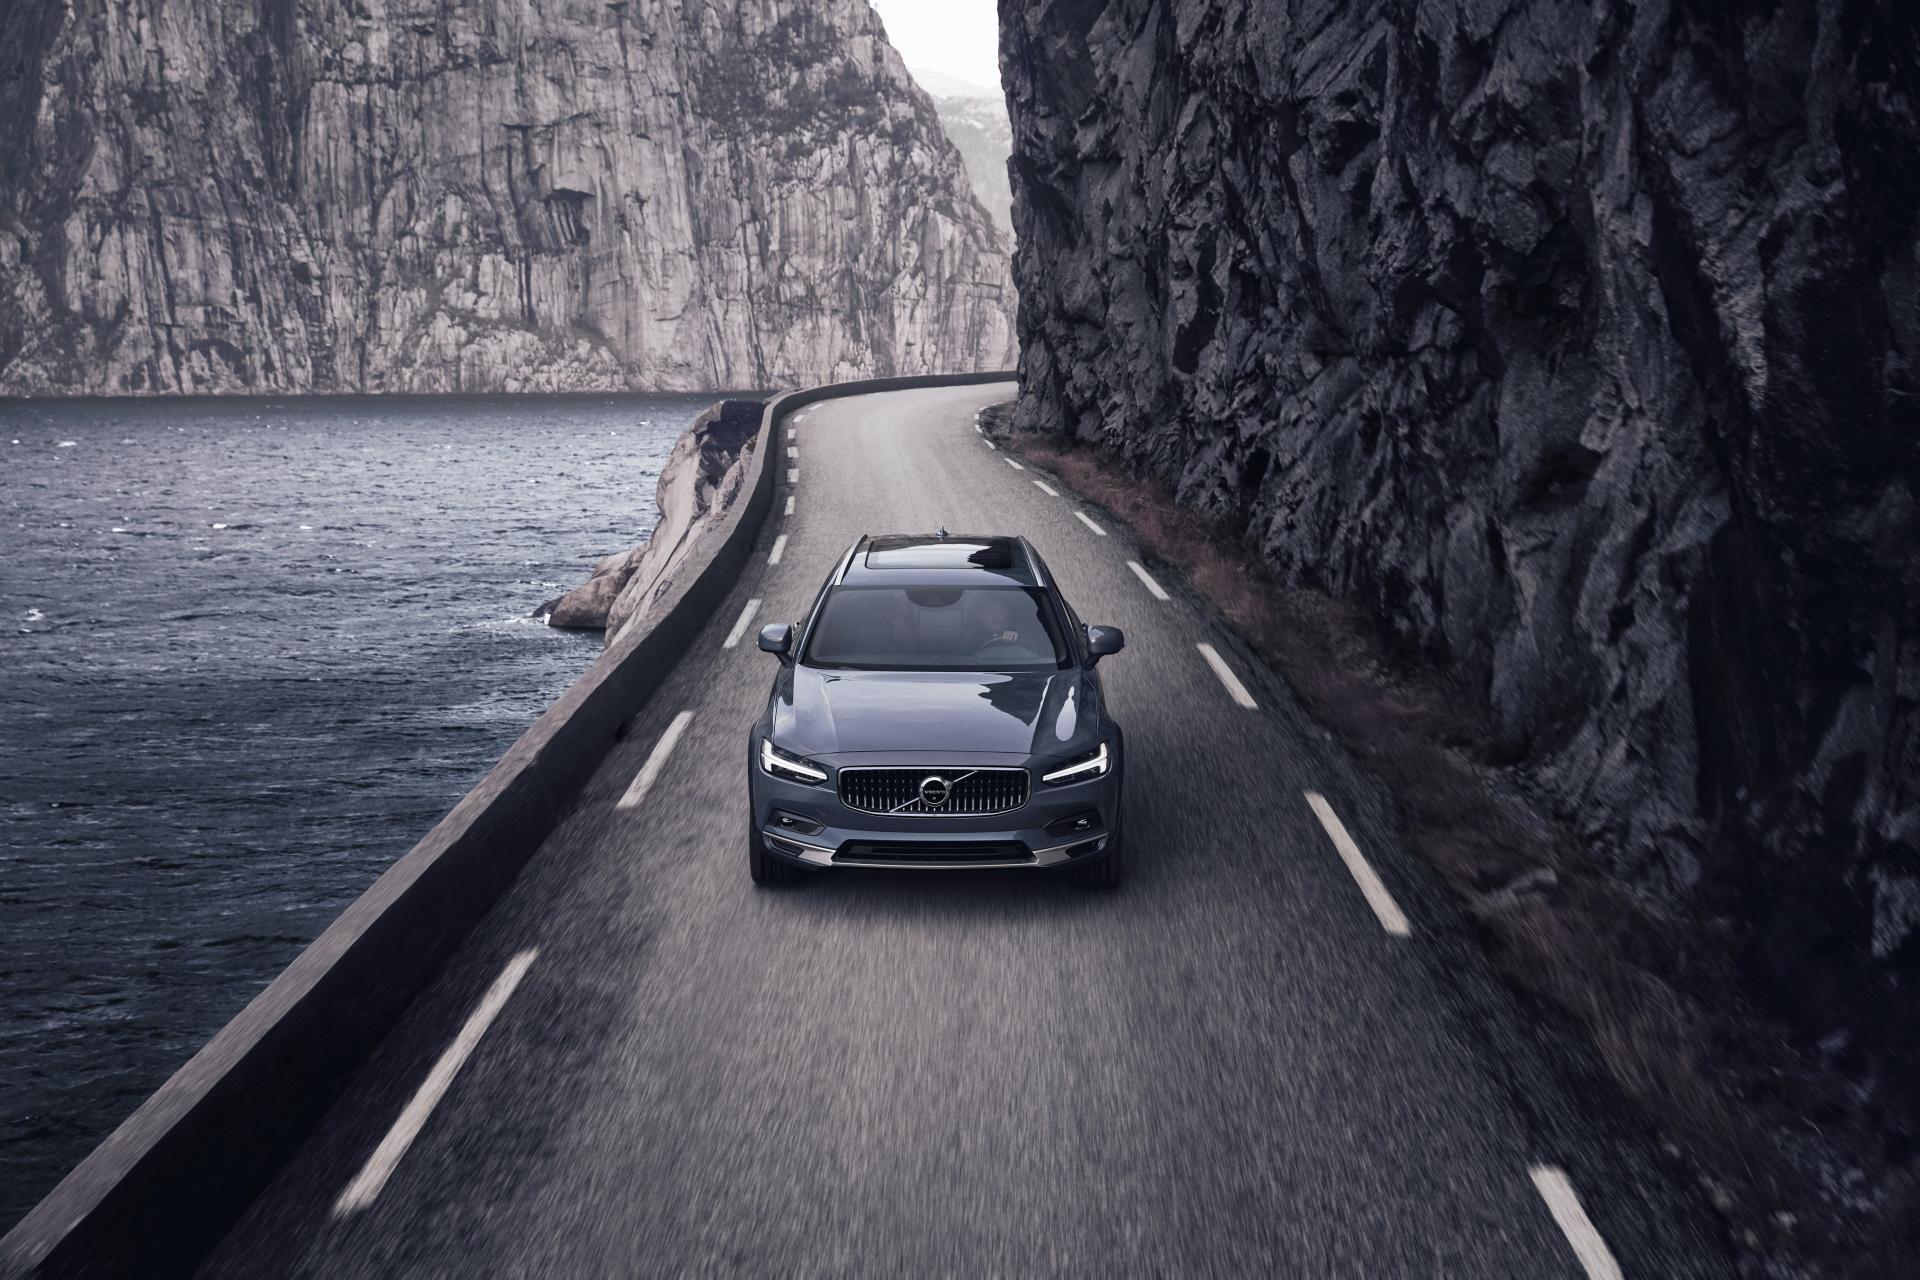 2021-Volvo-S90-V90 (5)